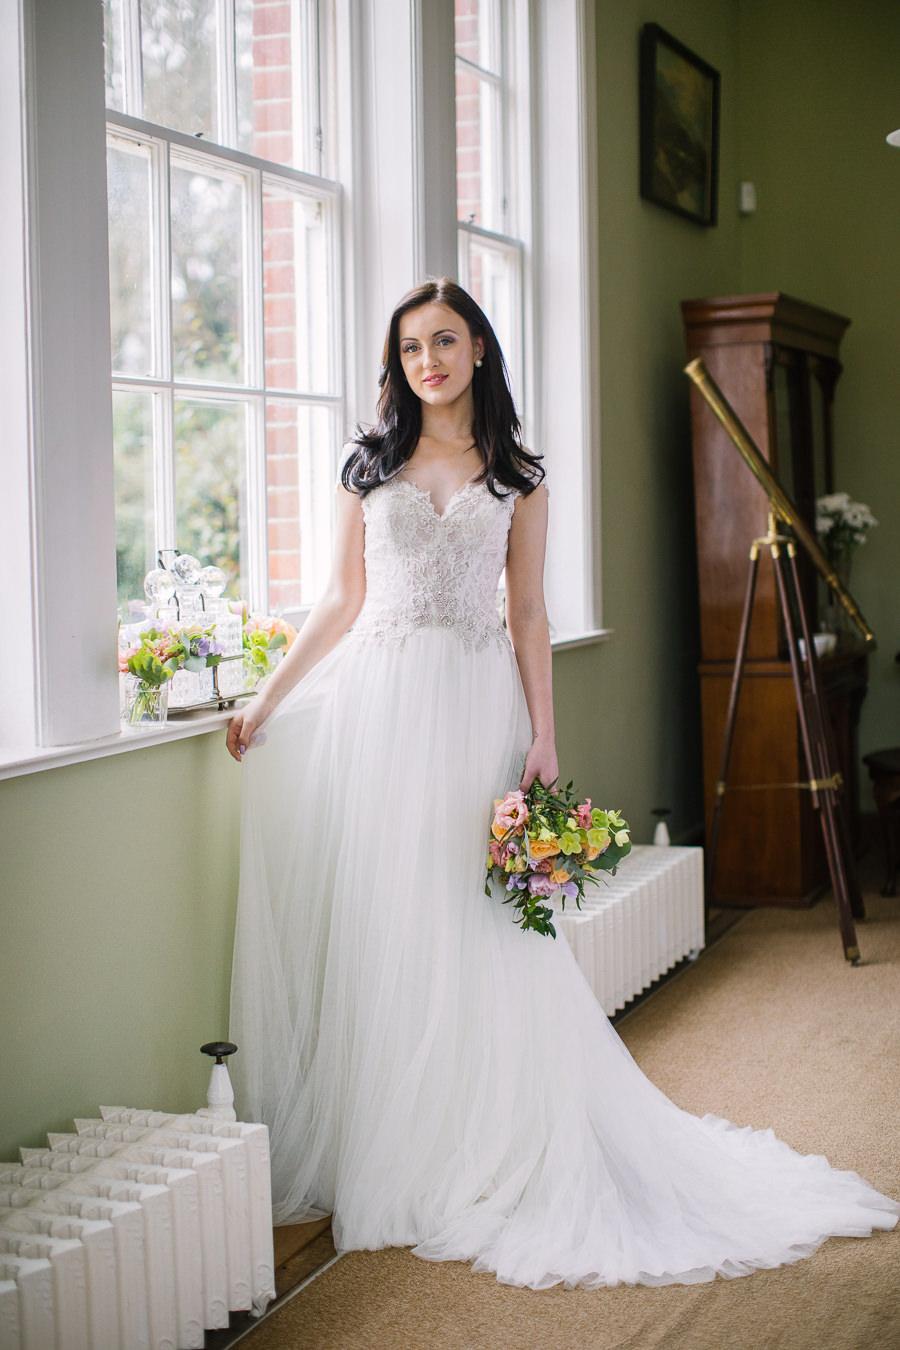 'Understated Elegance' Spring Styled Hampshire Bridal Shoot – Rownhams House, photo credit Nisha Haq Photography (6)